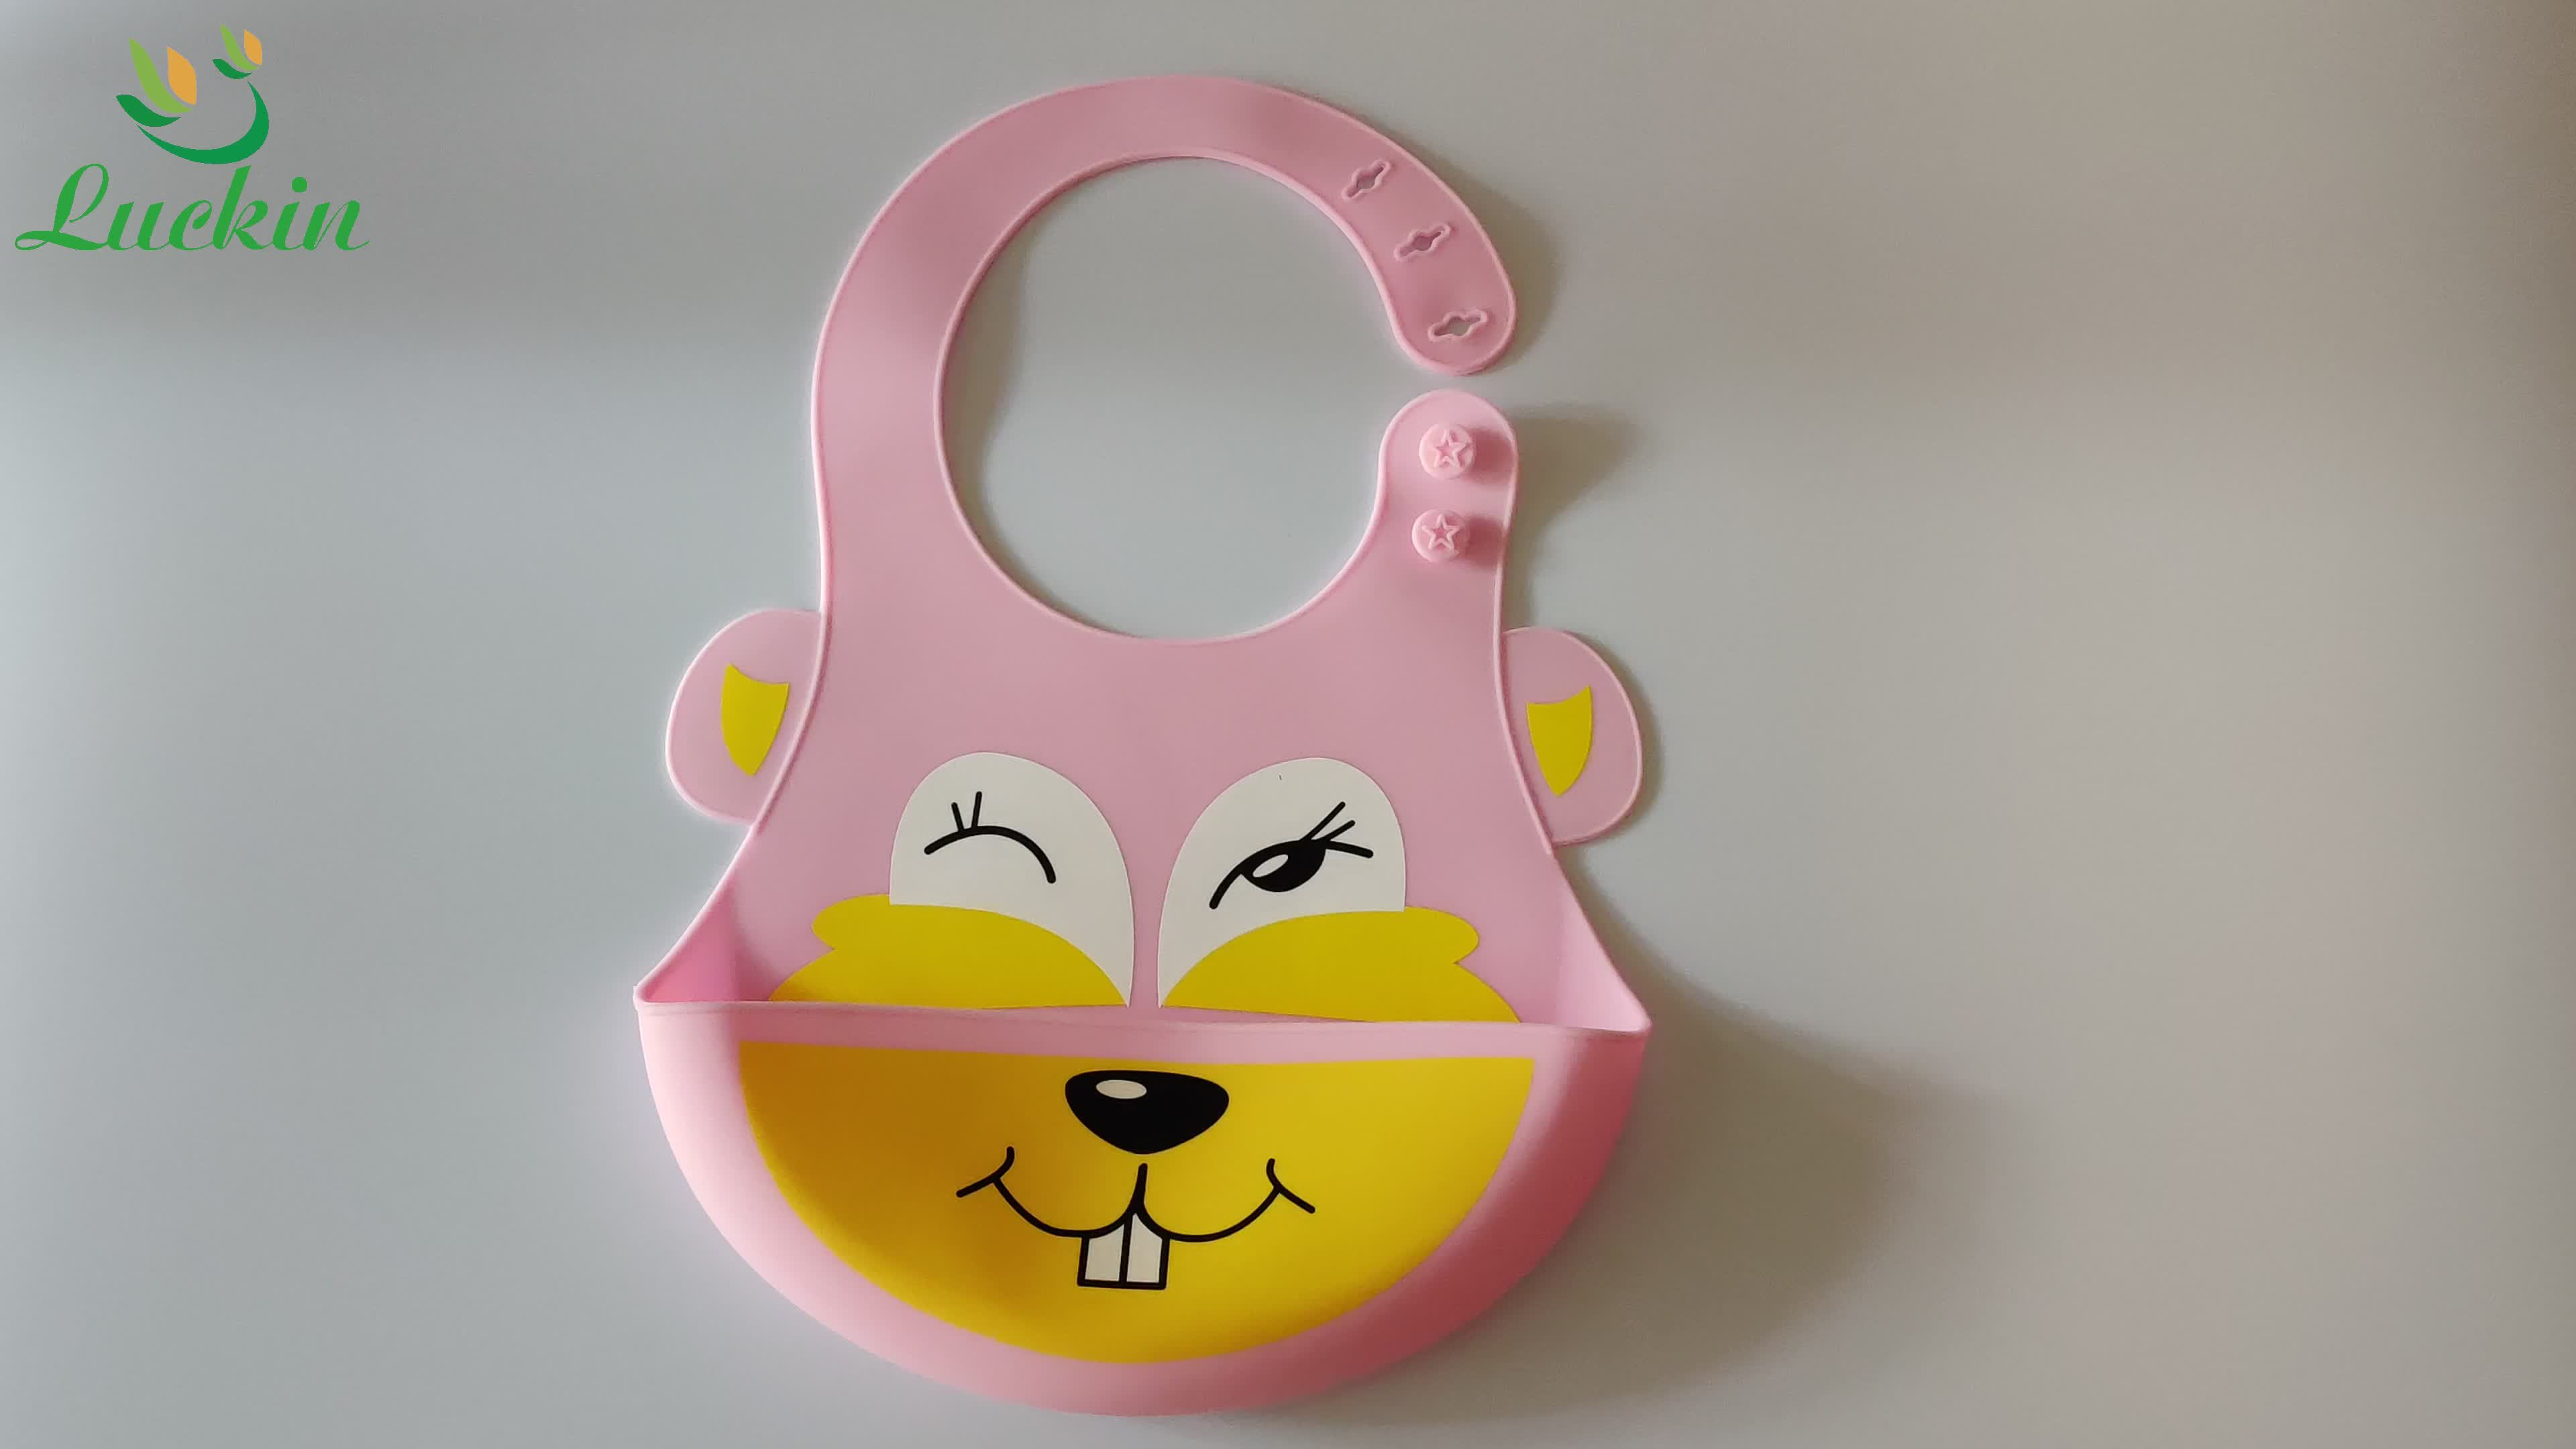 Factory Wholesale Waterproof Baby Bibs Comfortable Soft Custom Print Silicone Baby Bibs